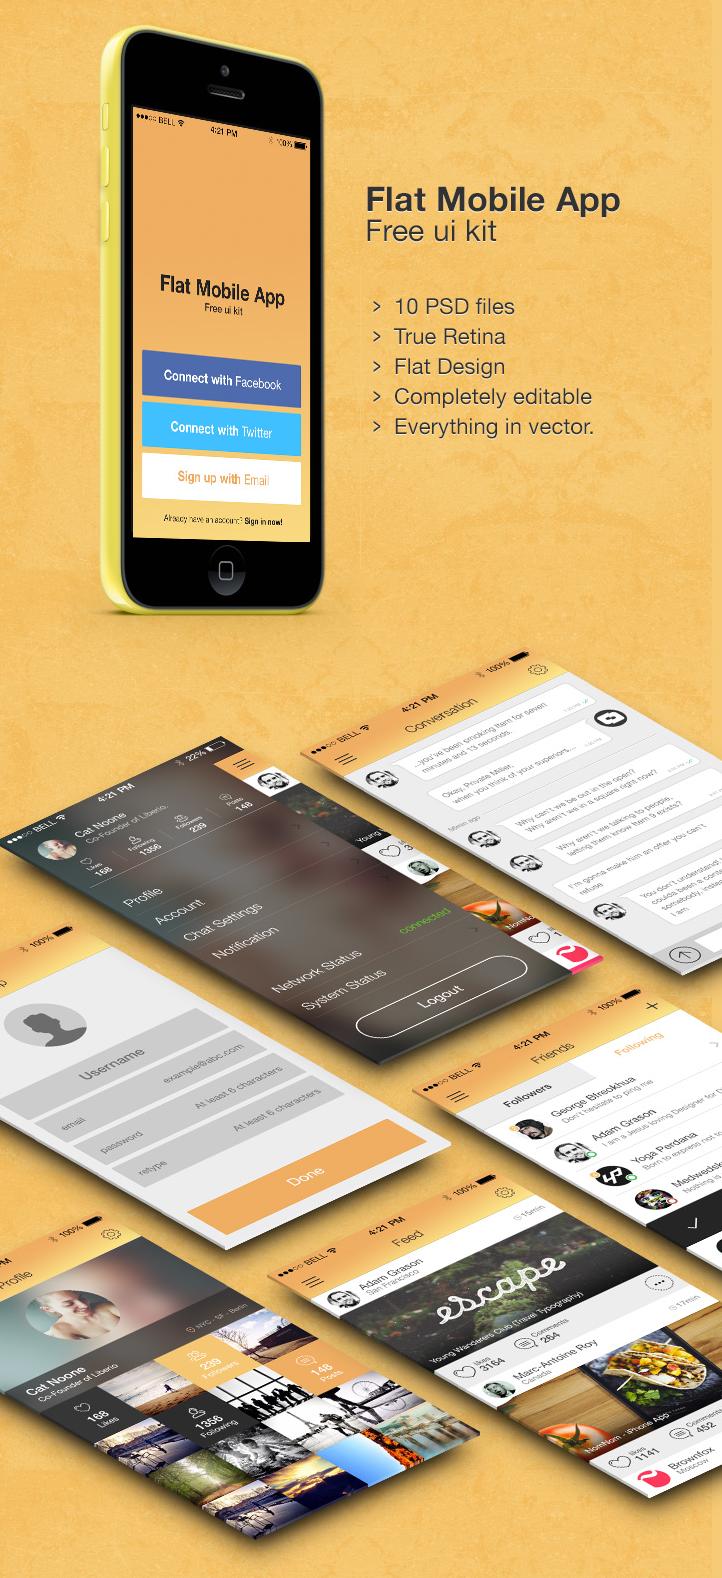 Flat Mobile App - Free UI kit